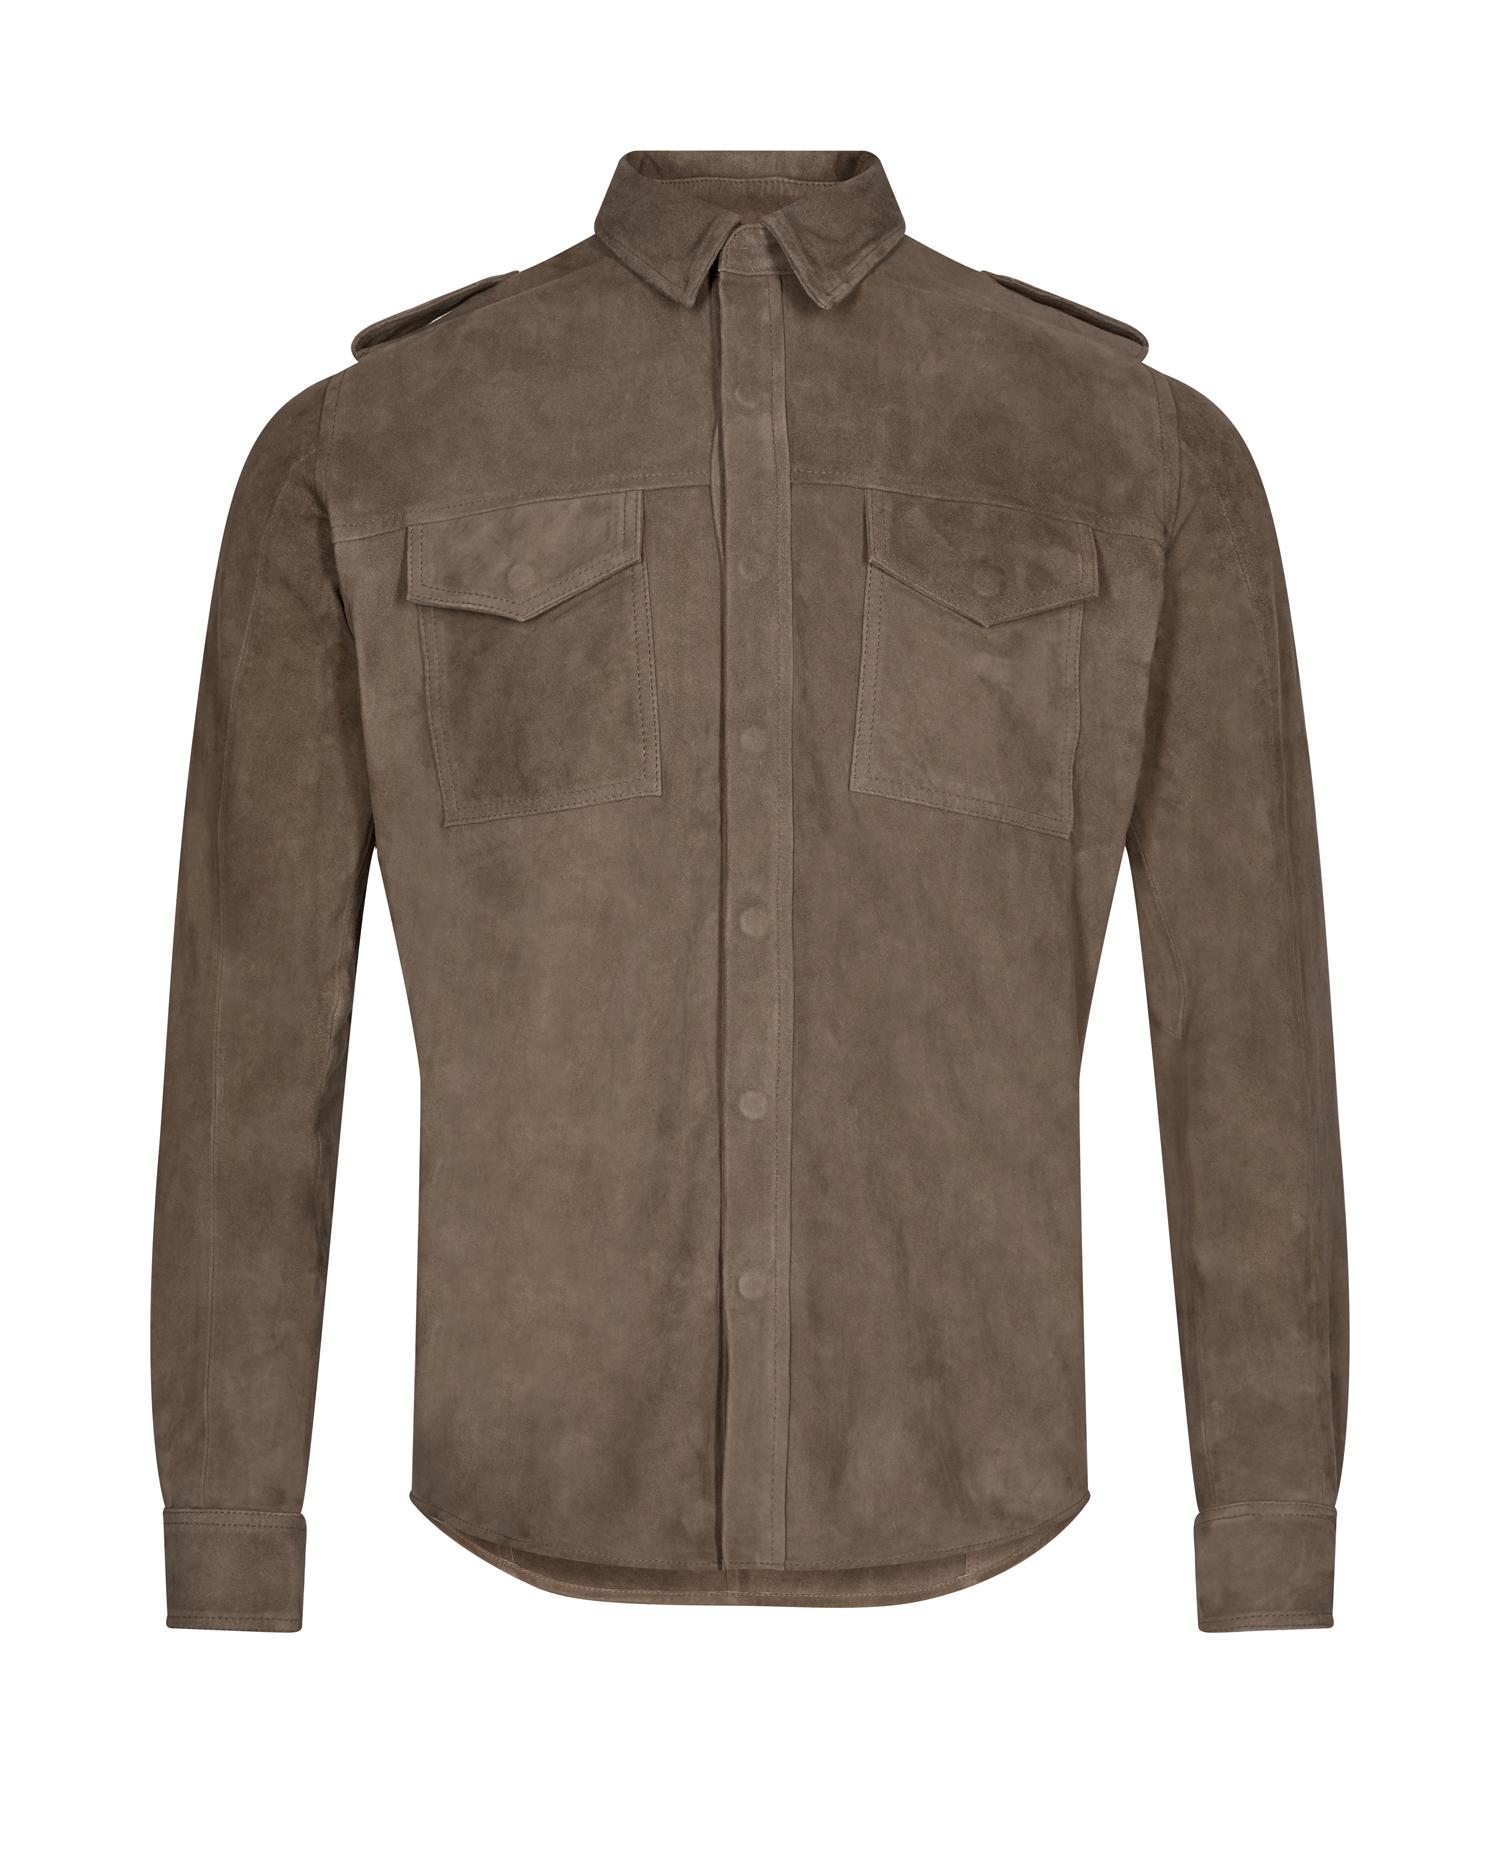 Ollie Leather Shirt